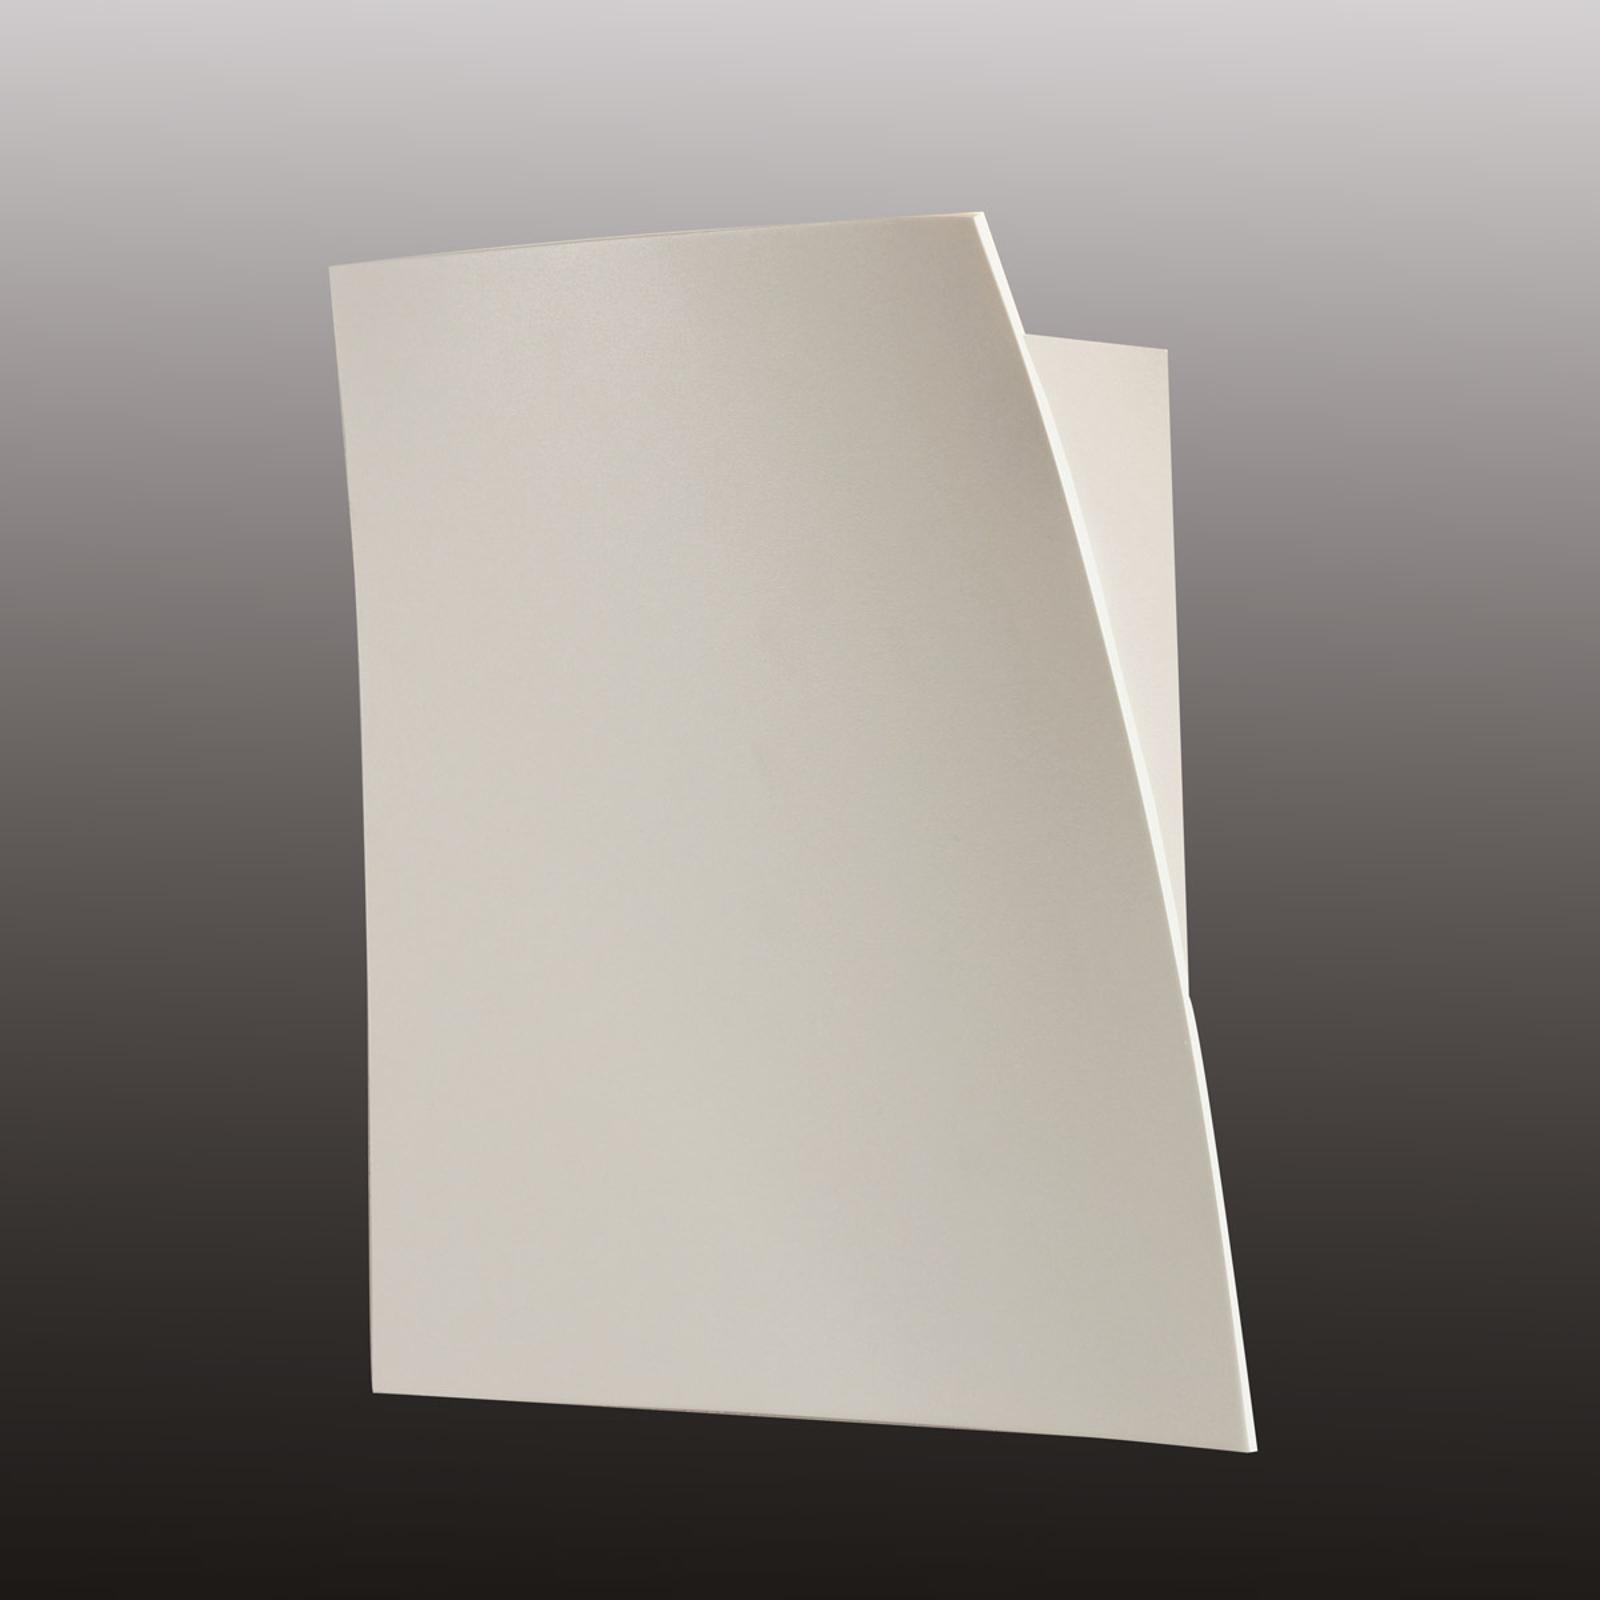 Escale Gap matné biele nástenné LED svietidlo_3051101_1